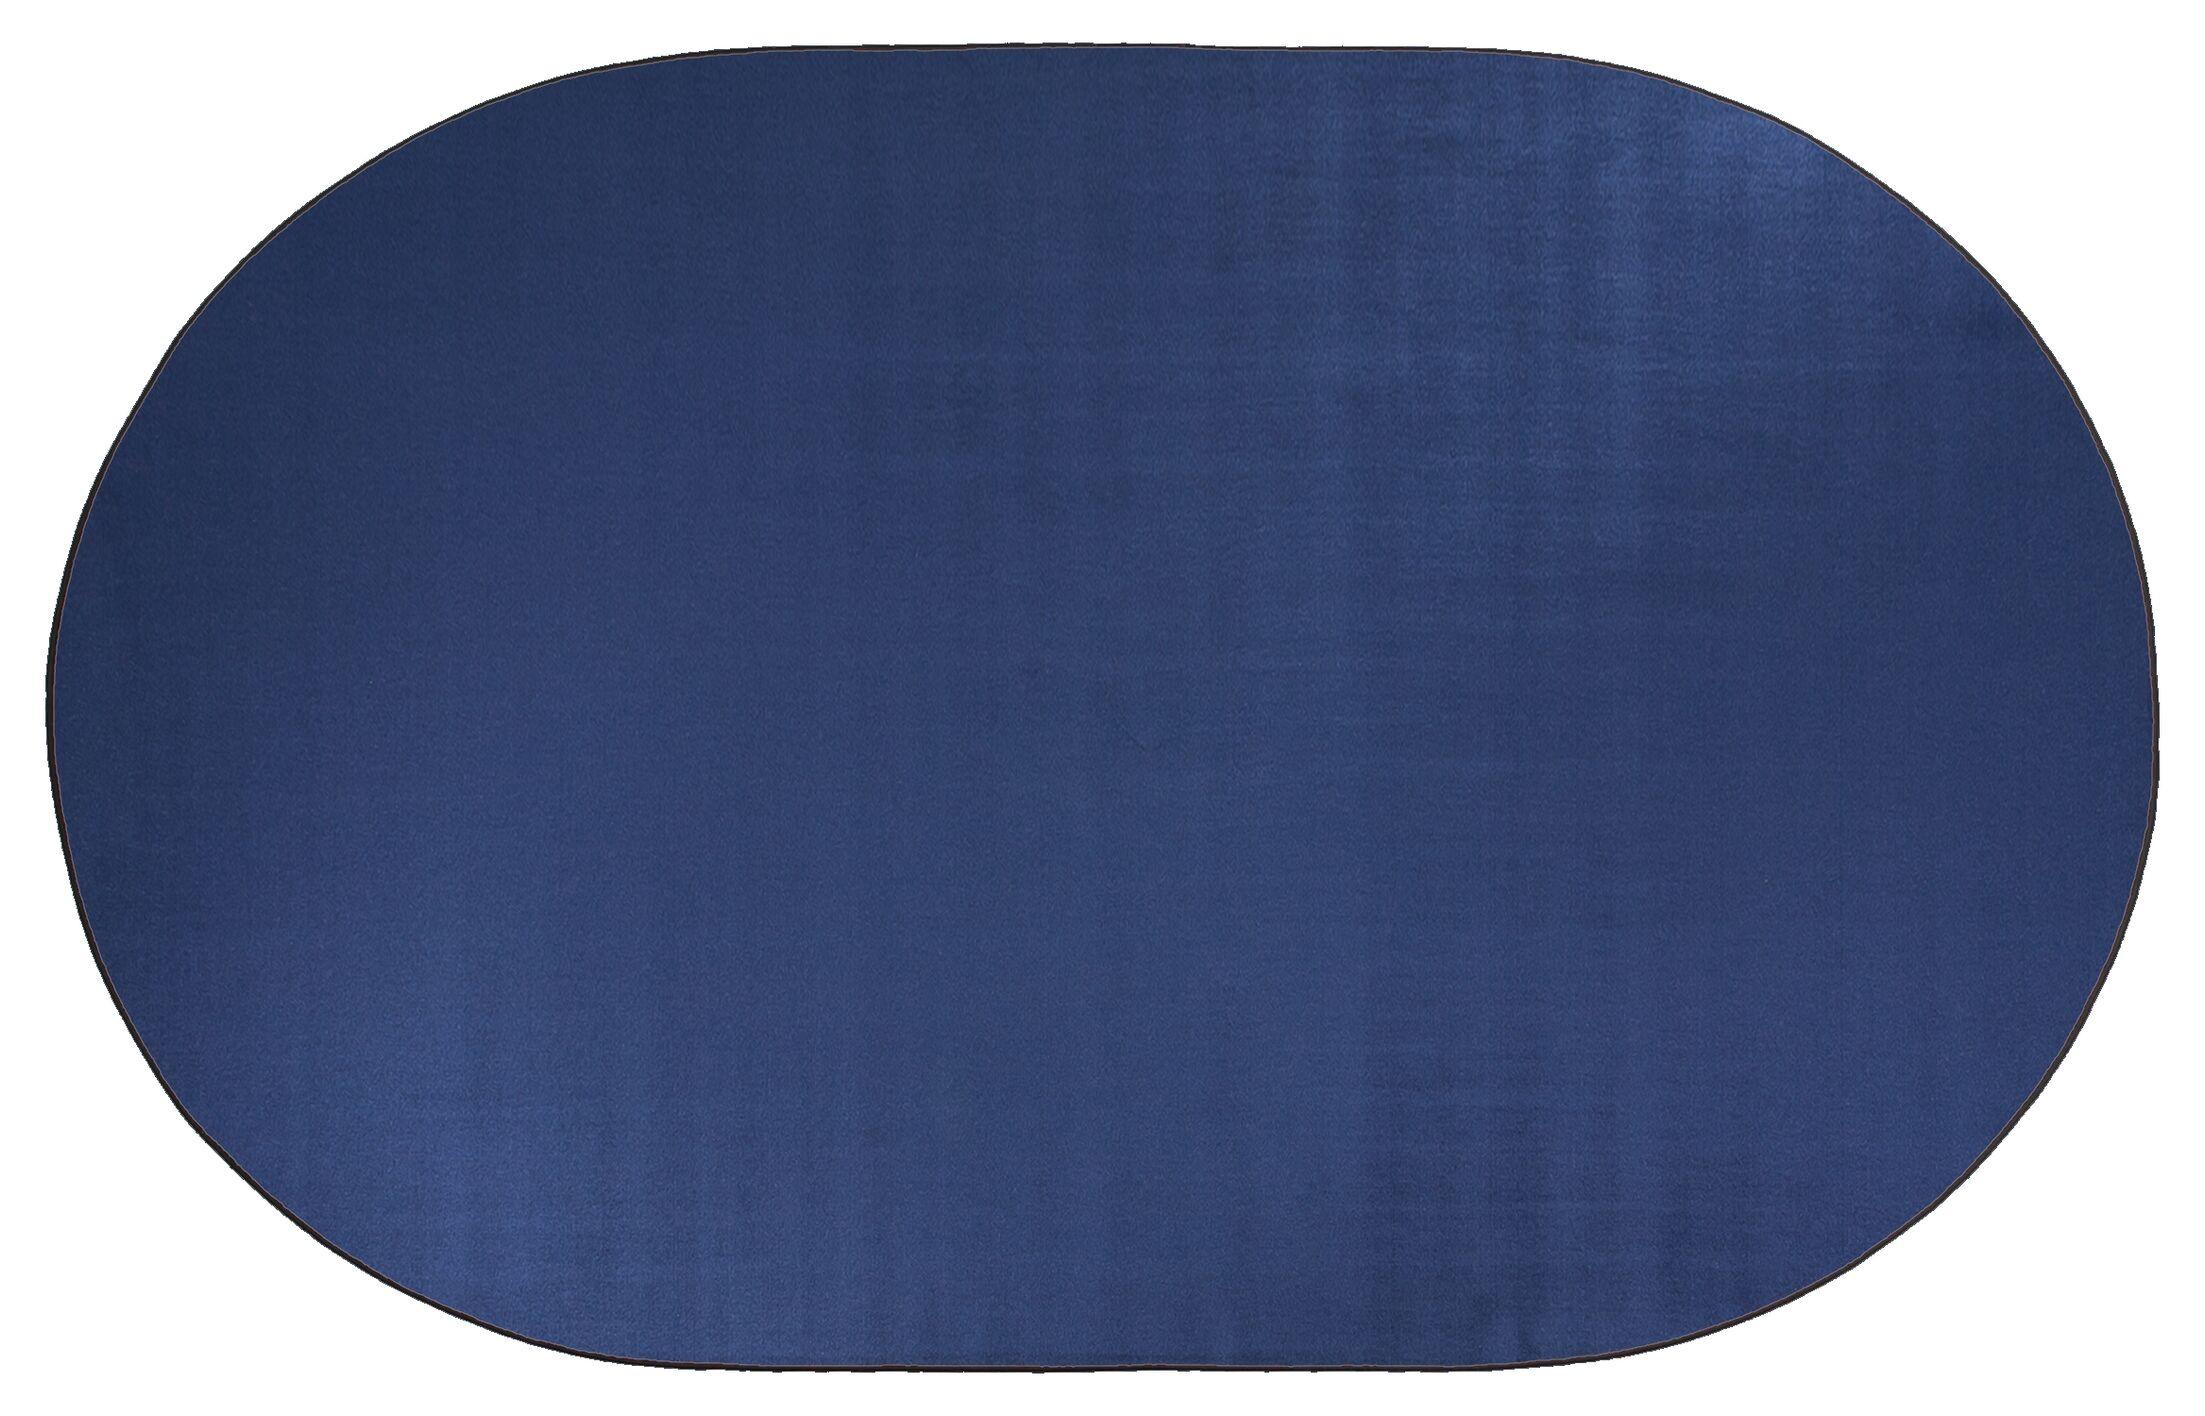 Americolors Royal Blue Area Rug Rug Size: Oval 6' x 9'